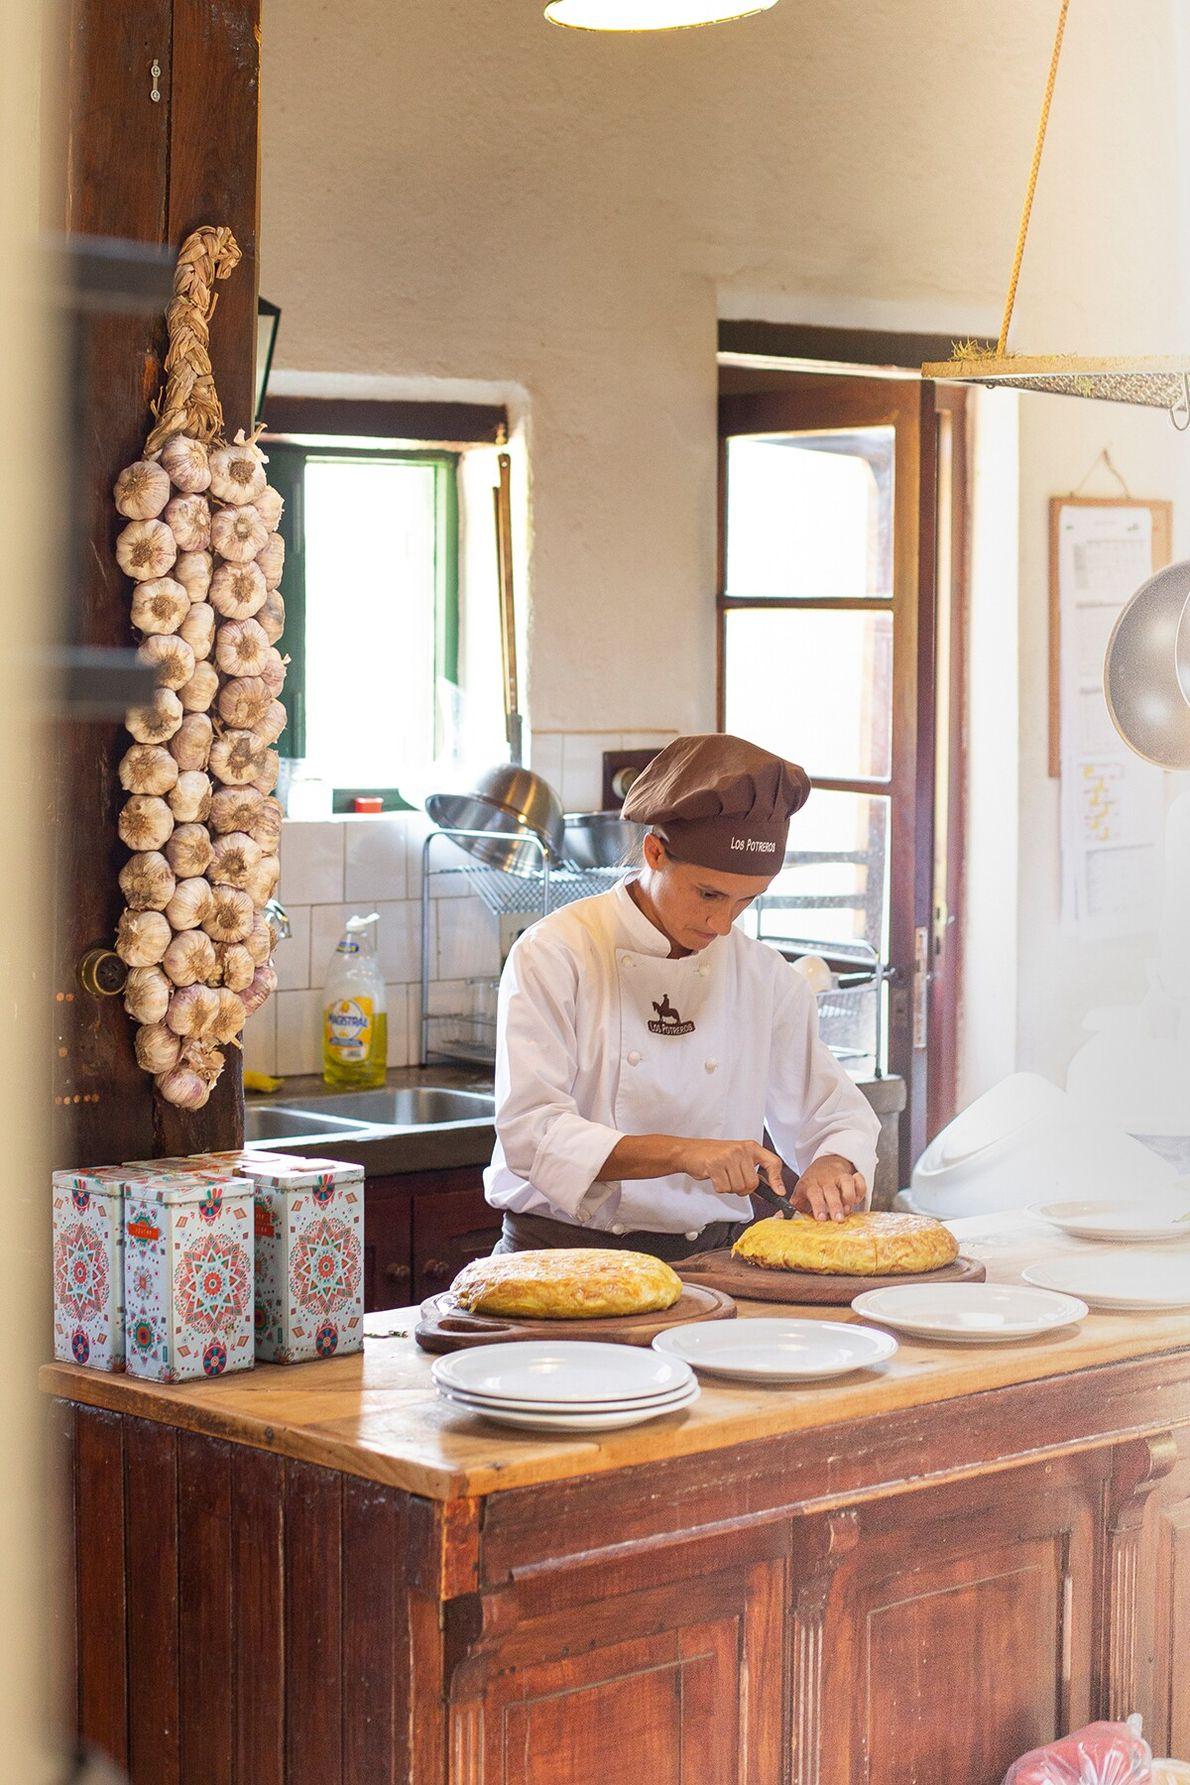 Chef Paula Delgado prepares a tortilla de papas, or Spanish omelette, made with potatoes and onions, ...